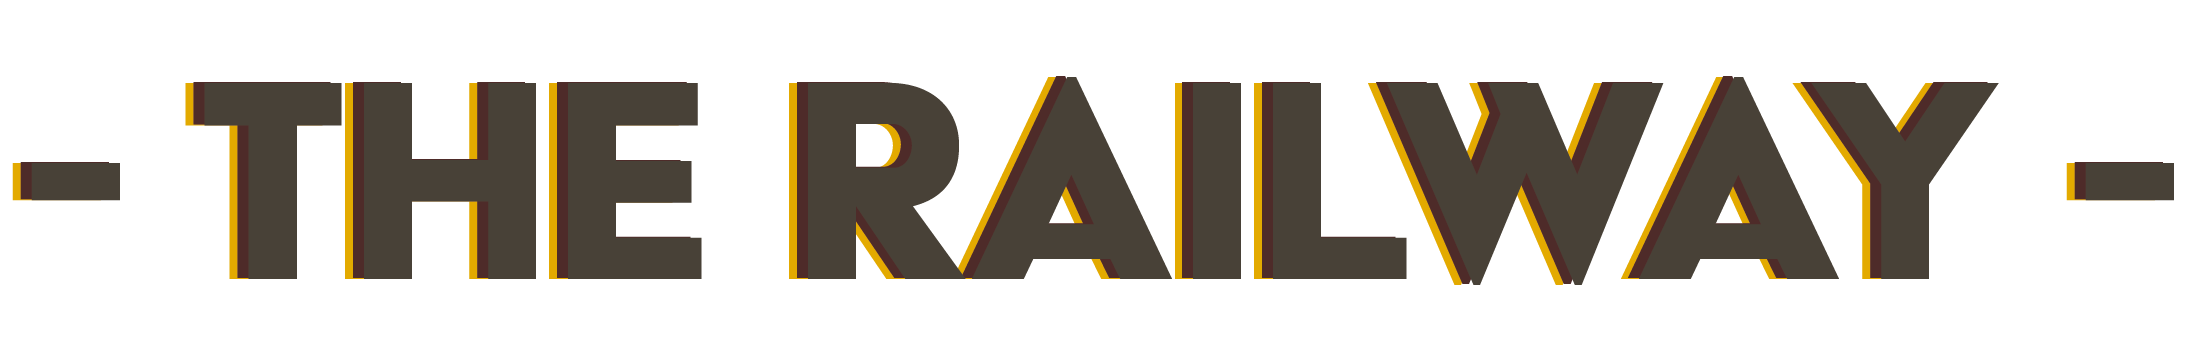 railway ringwood